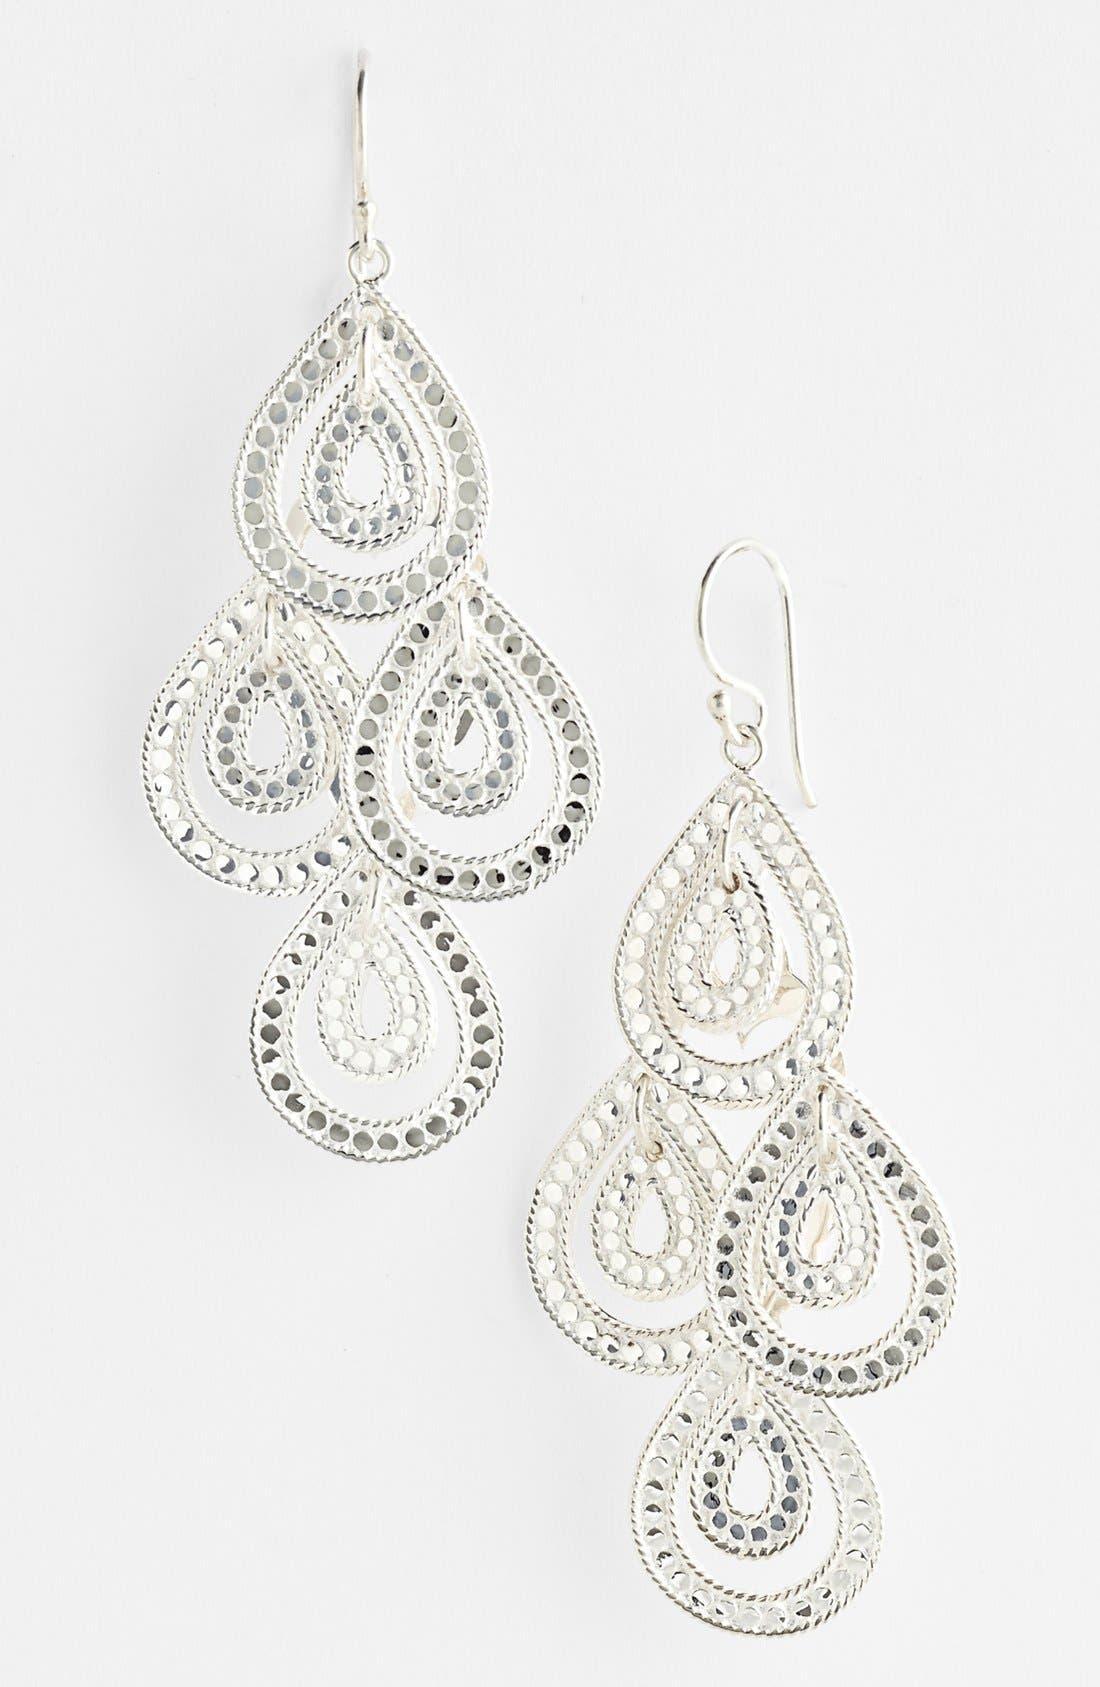 Main Image - Anna Beck 'Sulawesi' Double Teardrop Chandelier Earrings